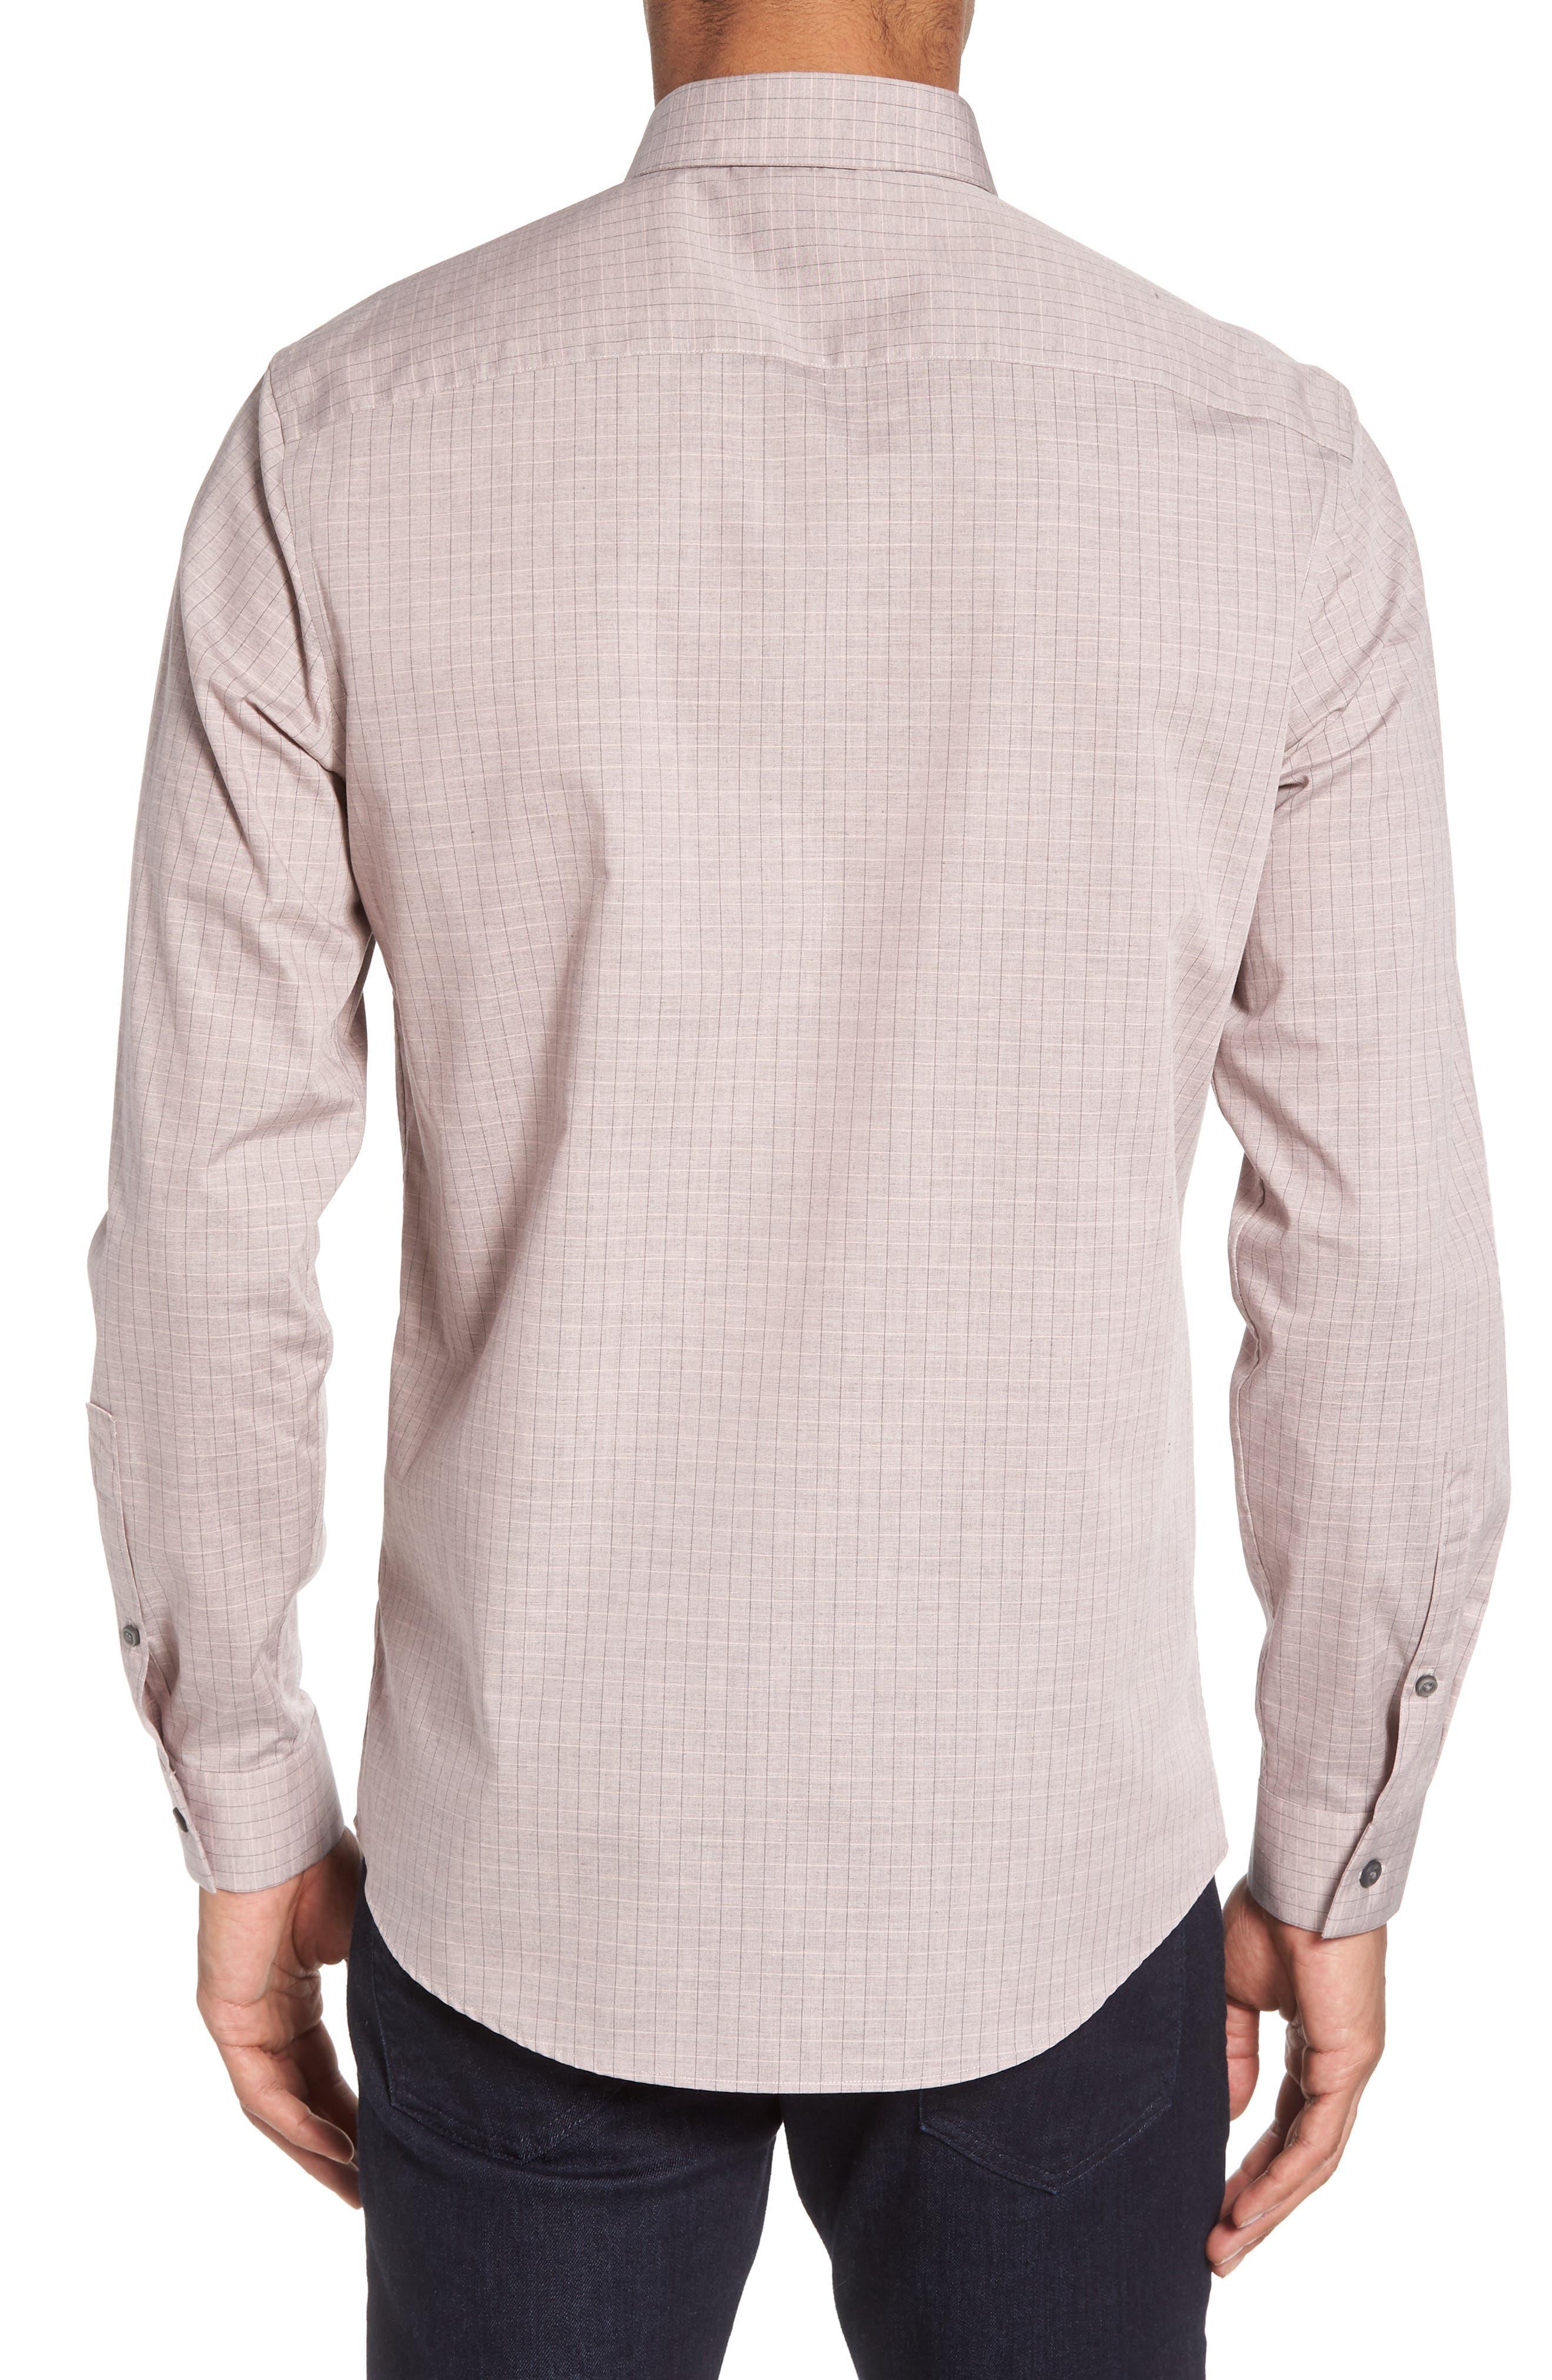 Grid Sport Shirt,                             Alternate thumbnail 3, color,                             Pink Silver Heather Grid